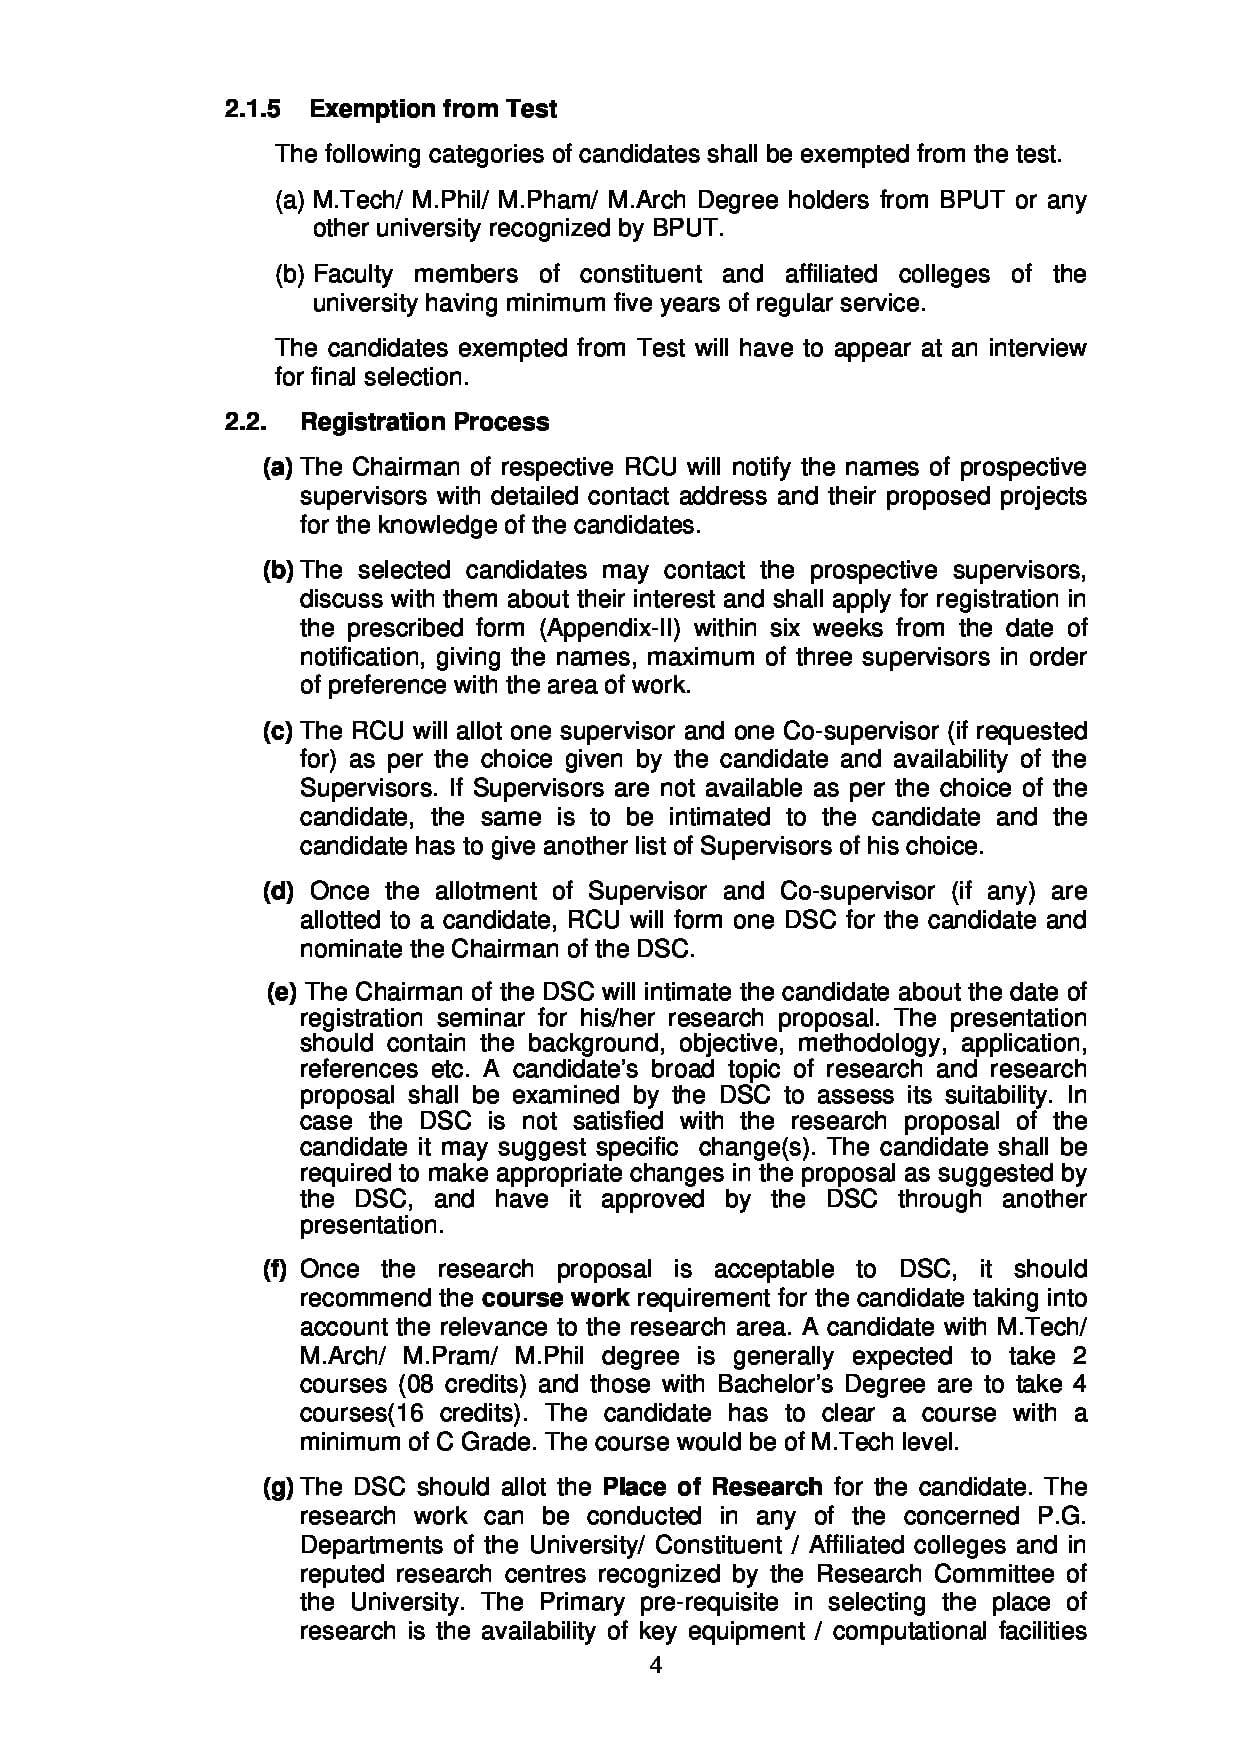 stellenbosch university application 2018 pdf